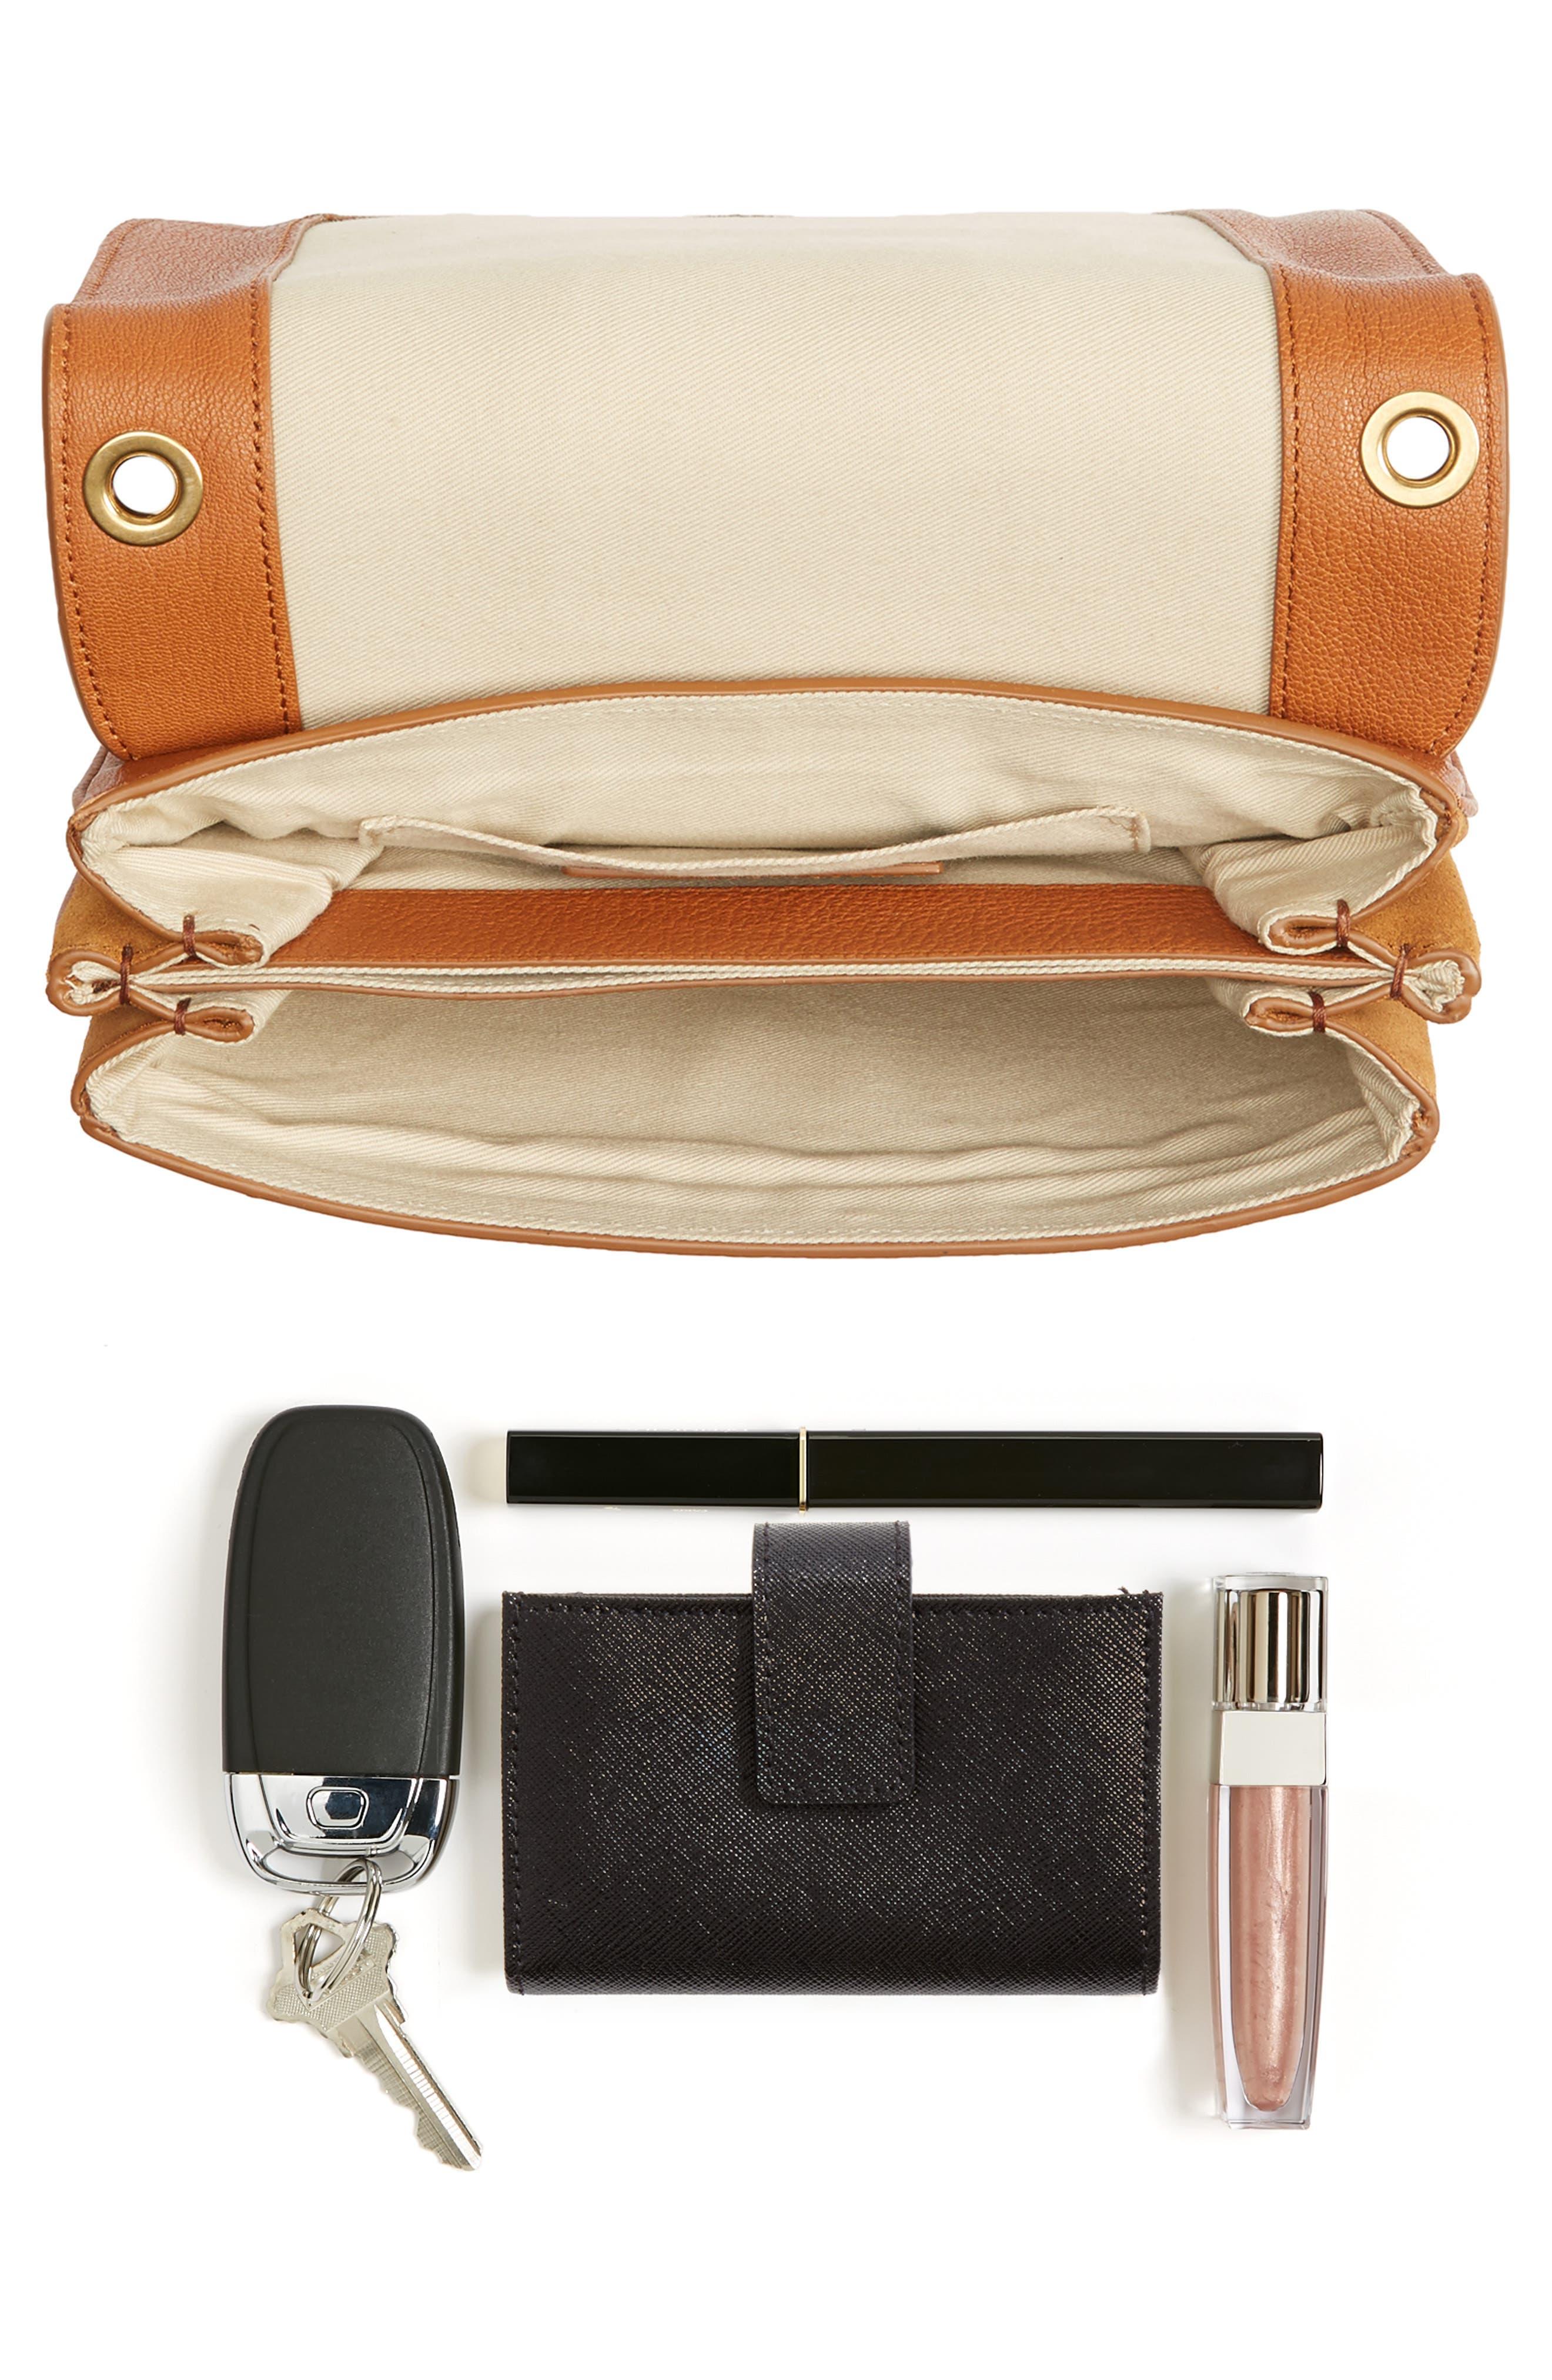 Hana Small Leather Crossbody Bag,                             Alternate thumbnail 33, color,